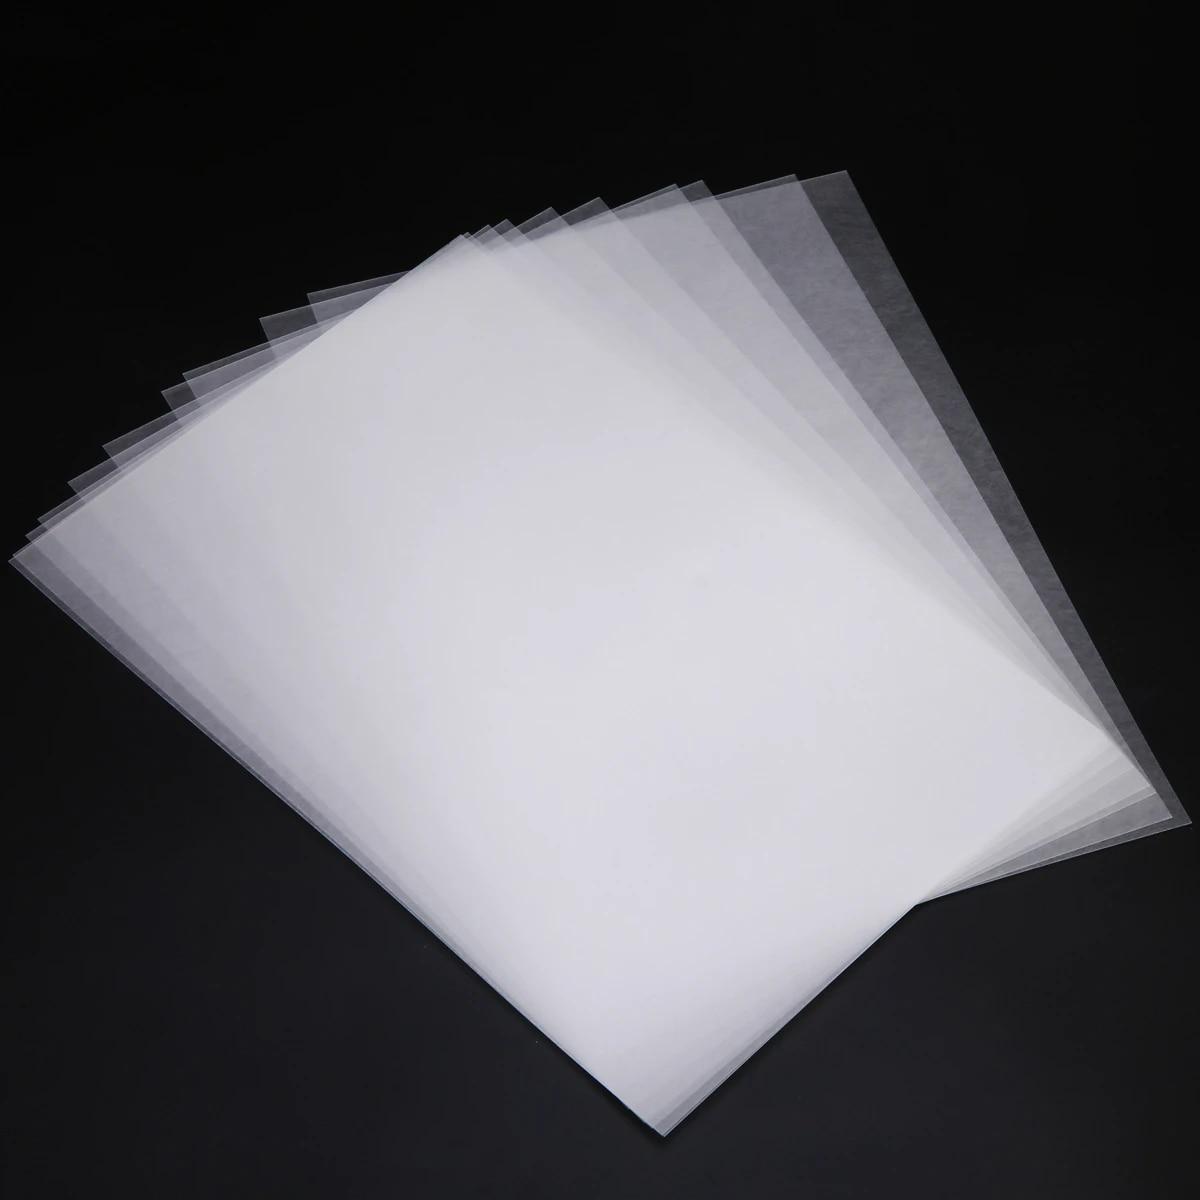 10Pcs Heat Shrink Paper Shrinkable Film for Keychain Pendants Jewelry Making